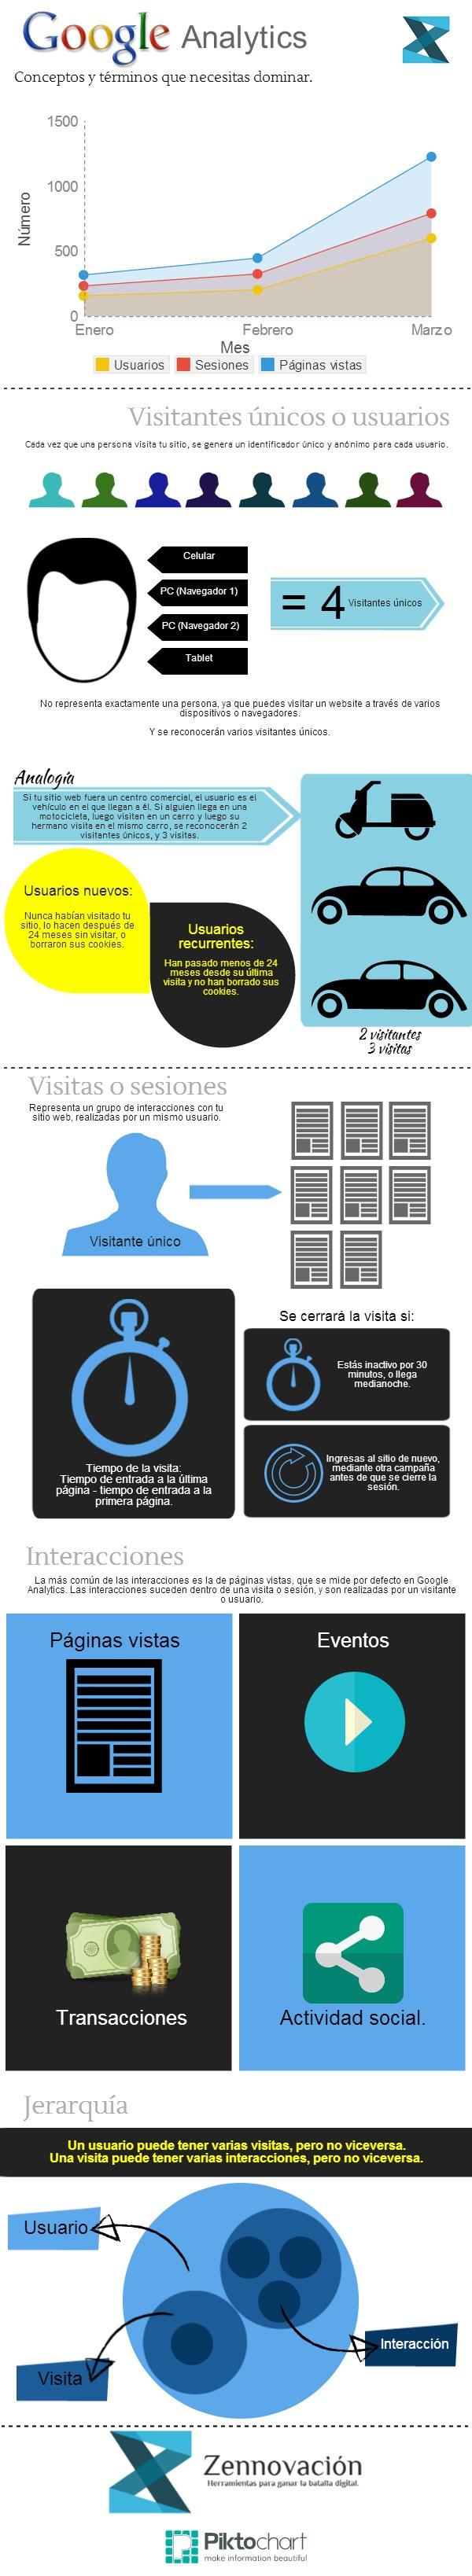 infografia_terminologia_de_google_analytics